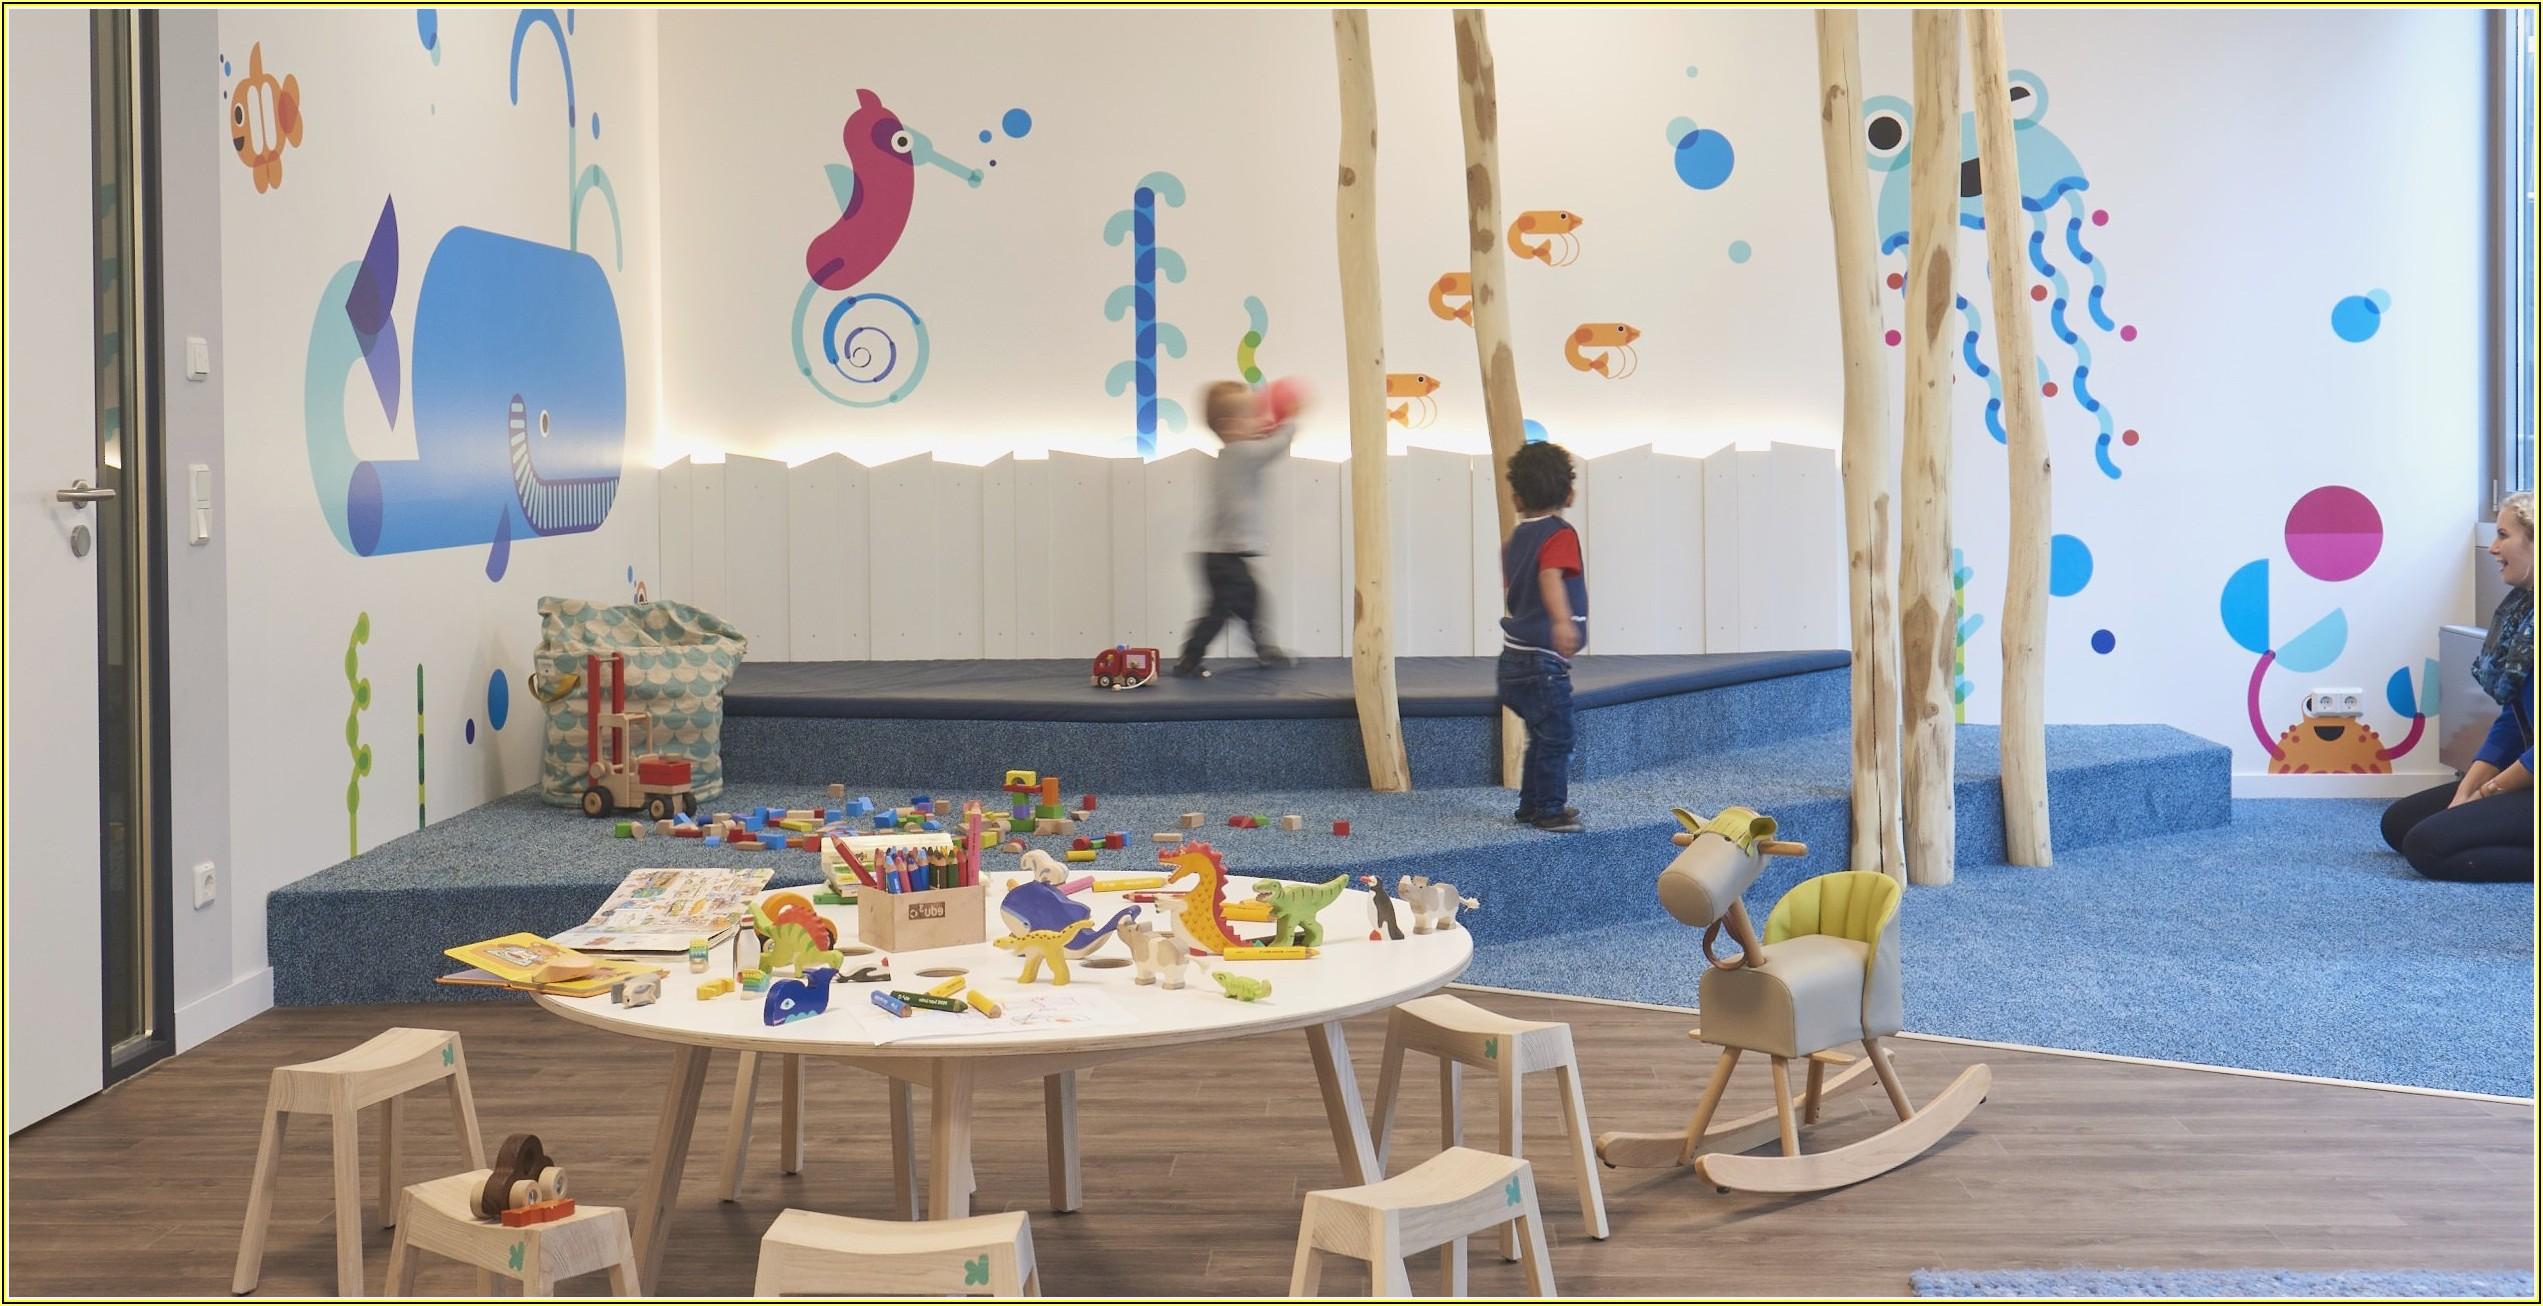 Kita Kinderzimmer Villa Flottbek